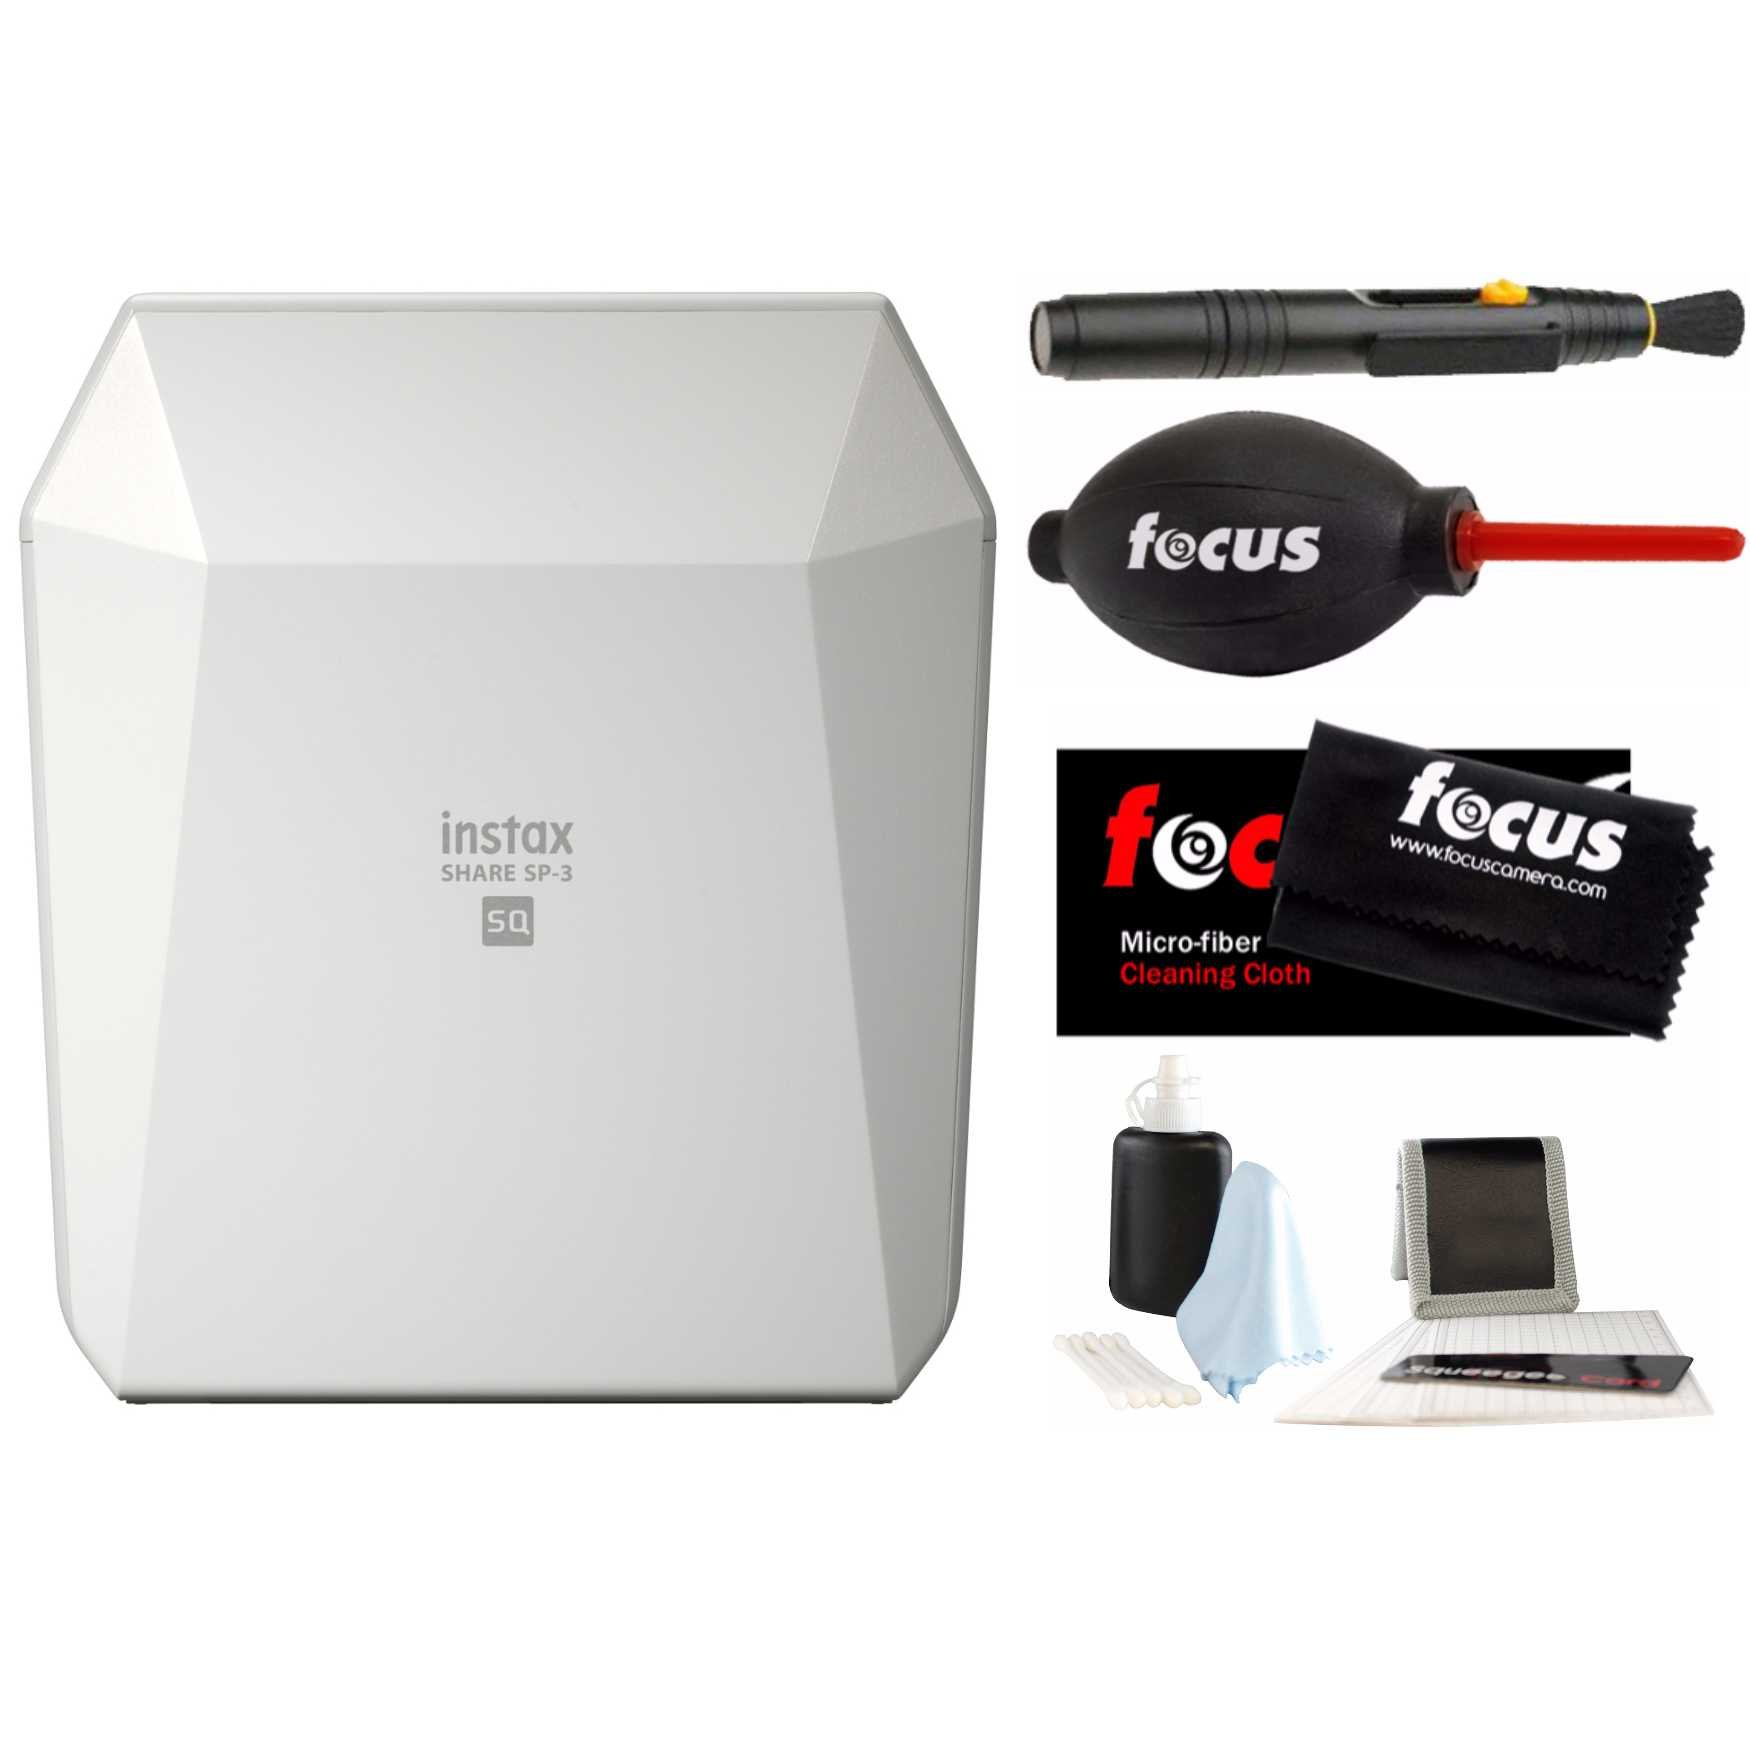 Fujifilm Instax Share SP-3 Smartphone Printer (White) w/Focus Accessory Kit